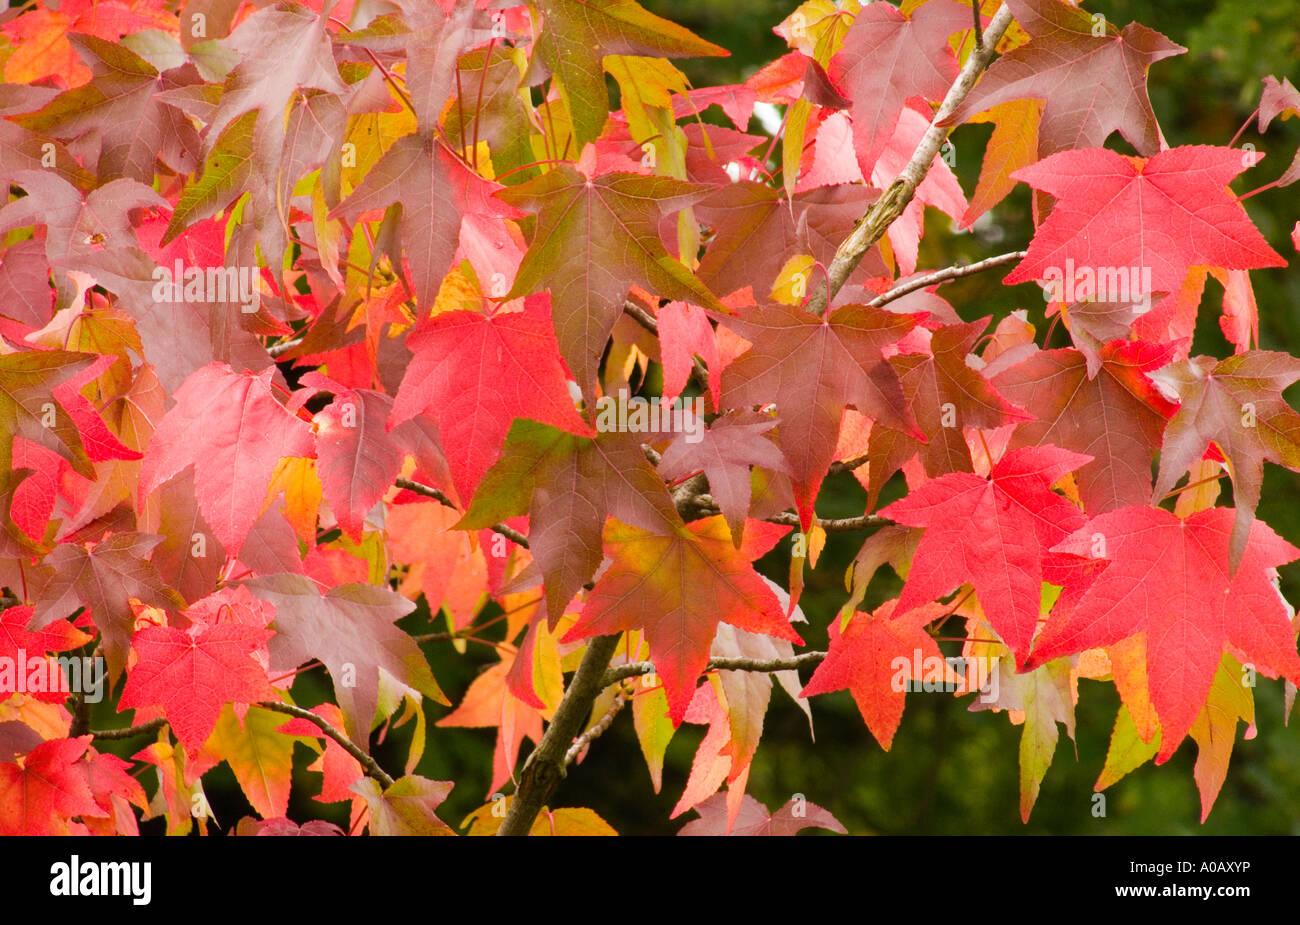 Sweet Gum Tree Leaves Turning Red In Autumn Liquidambar Styraciflua Stock Photo Alamy